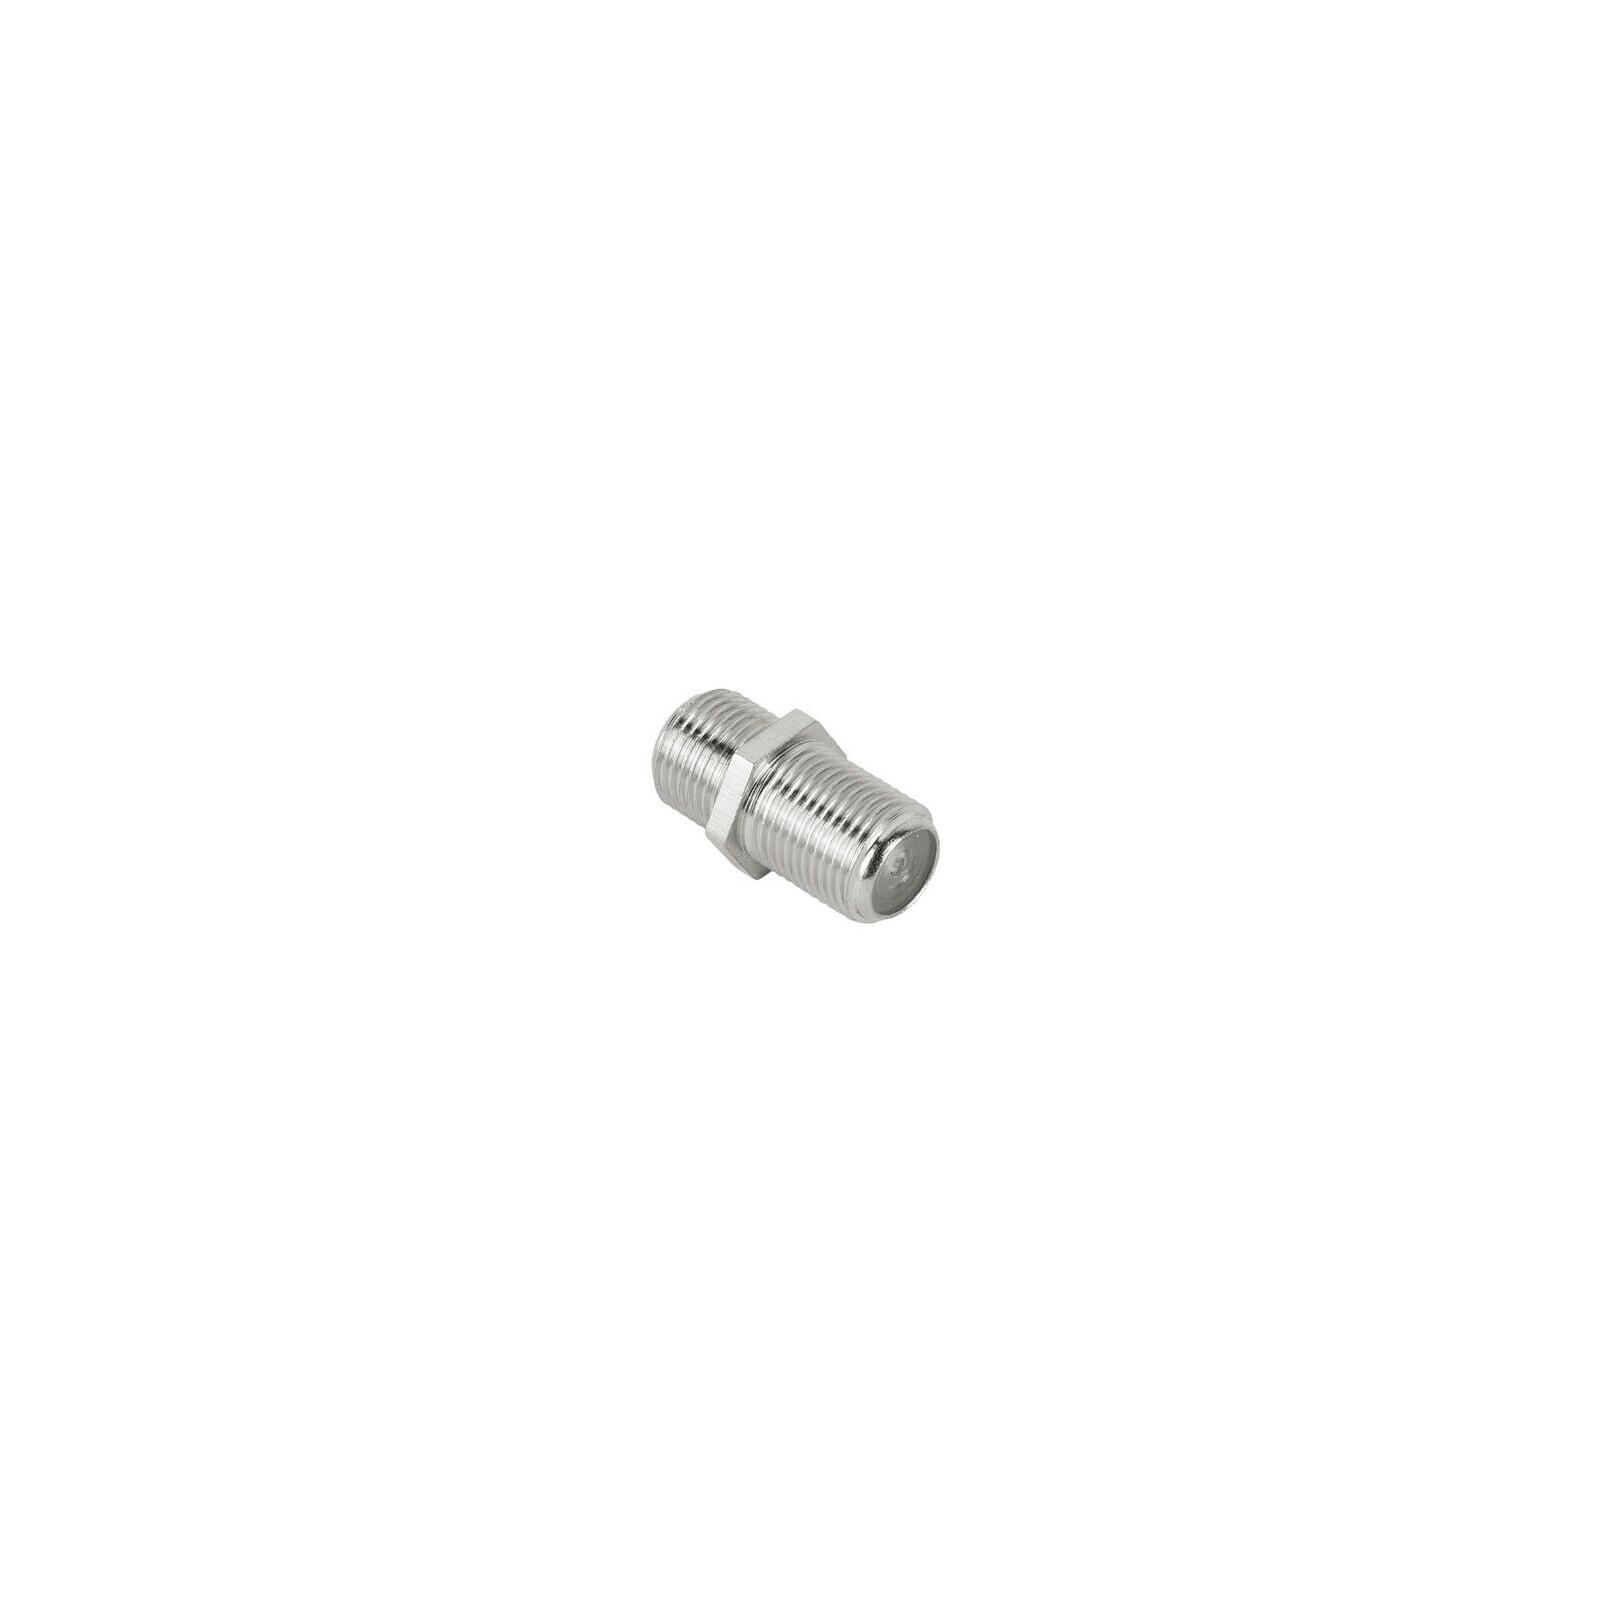 Hama 43451 SAT-Adapter F-Kupplung - F-Kupplung